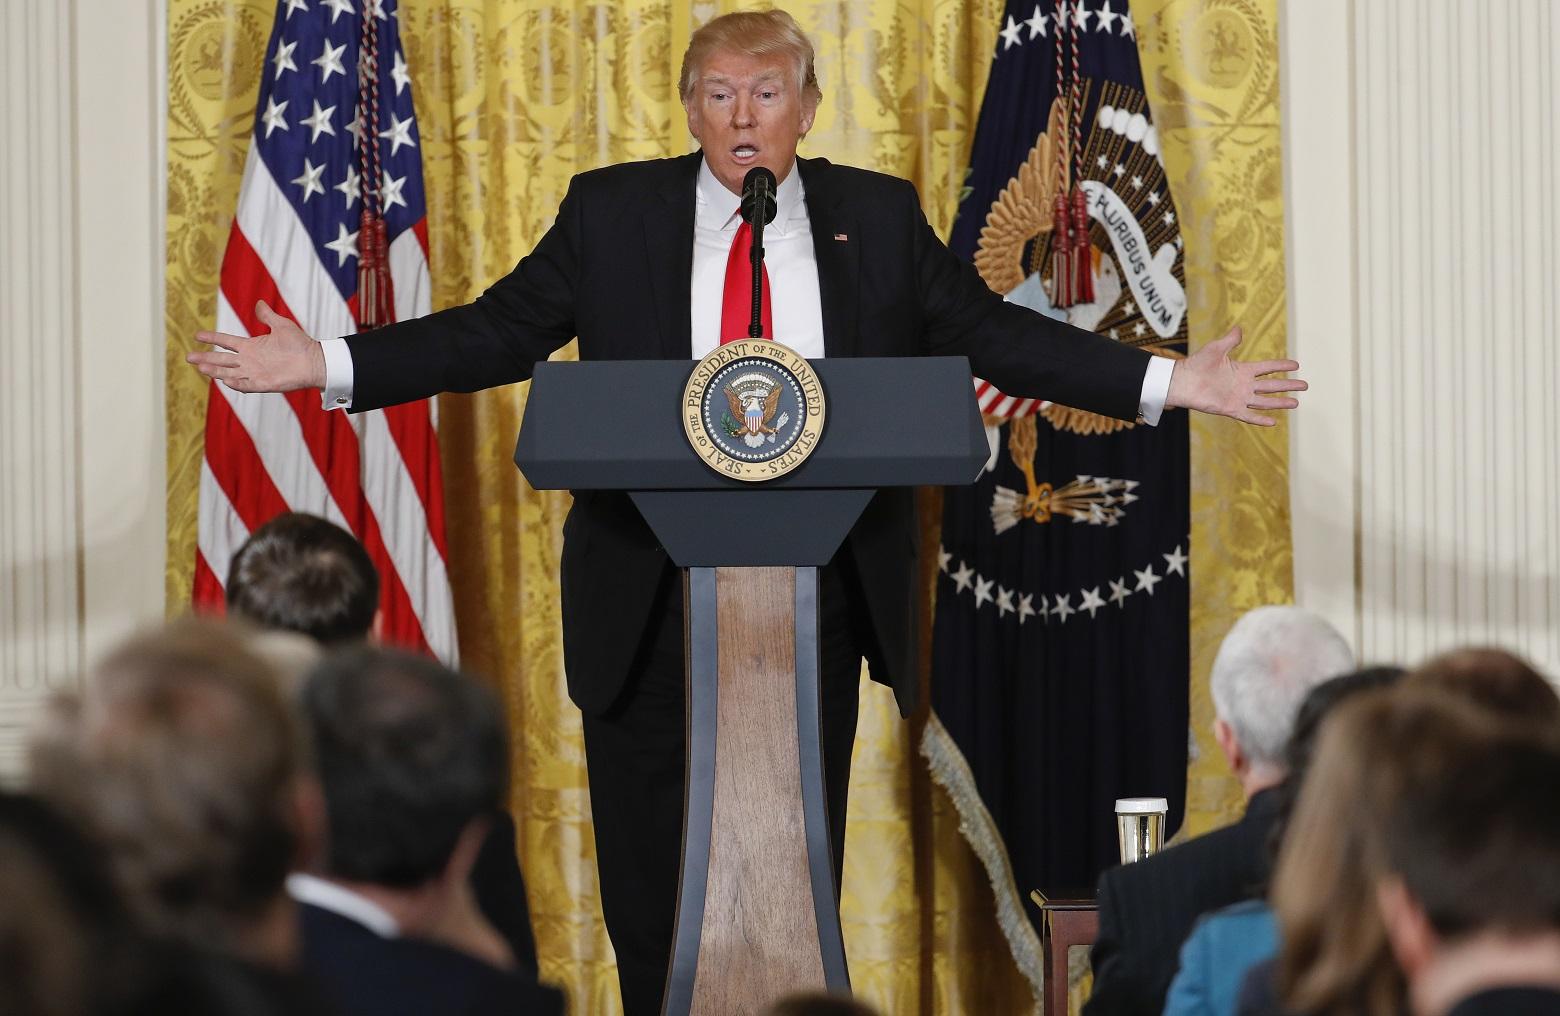 Donald Trump press conference video